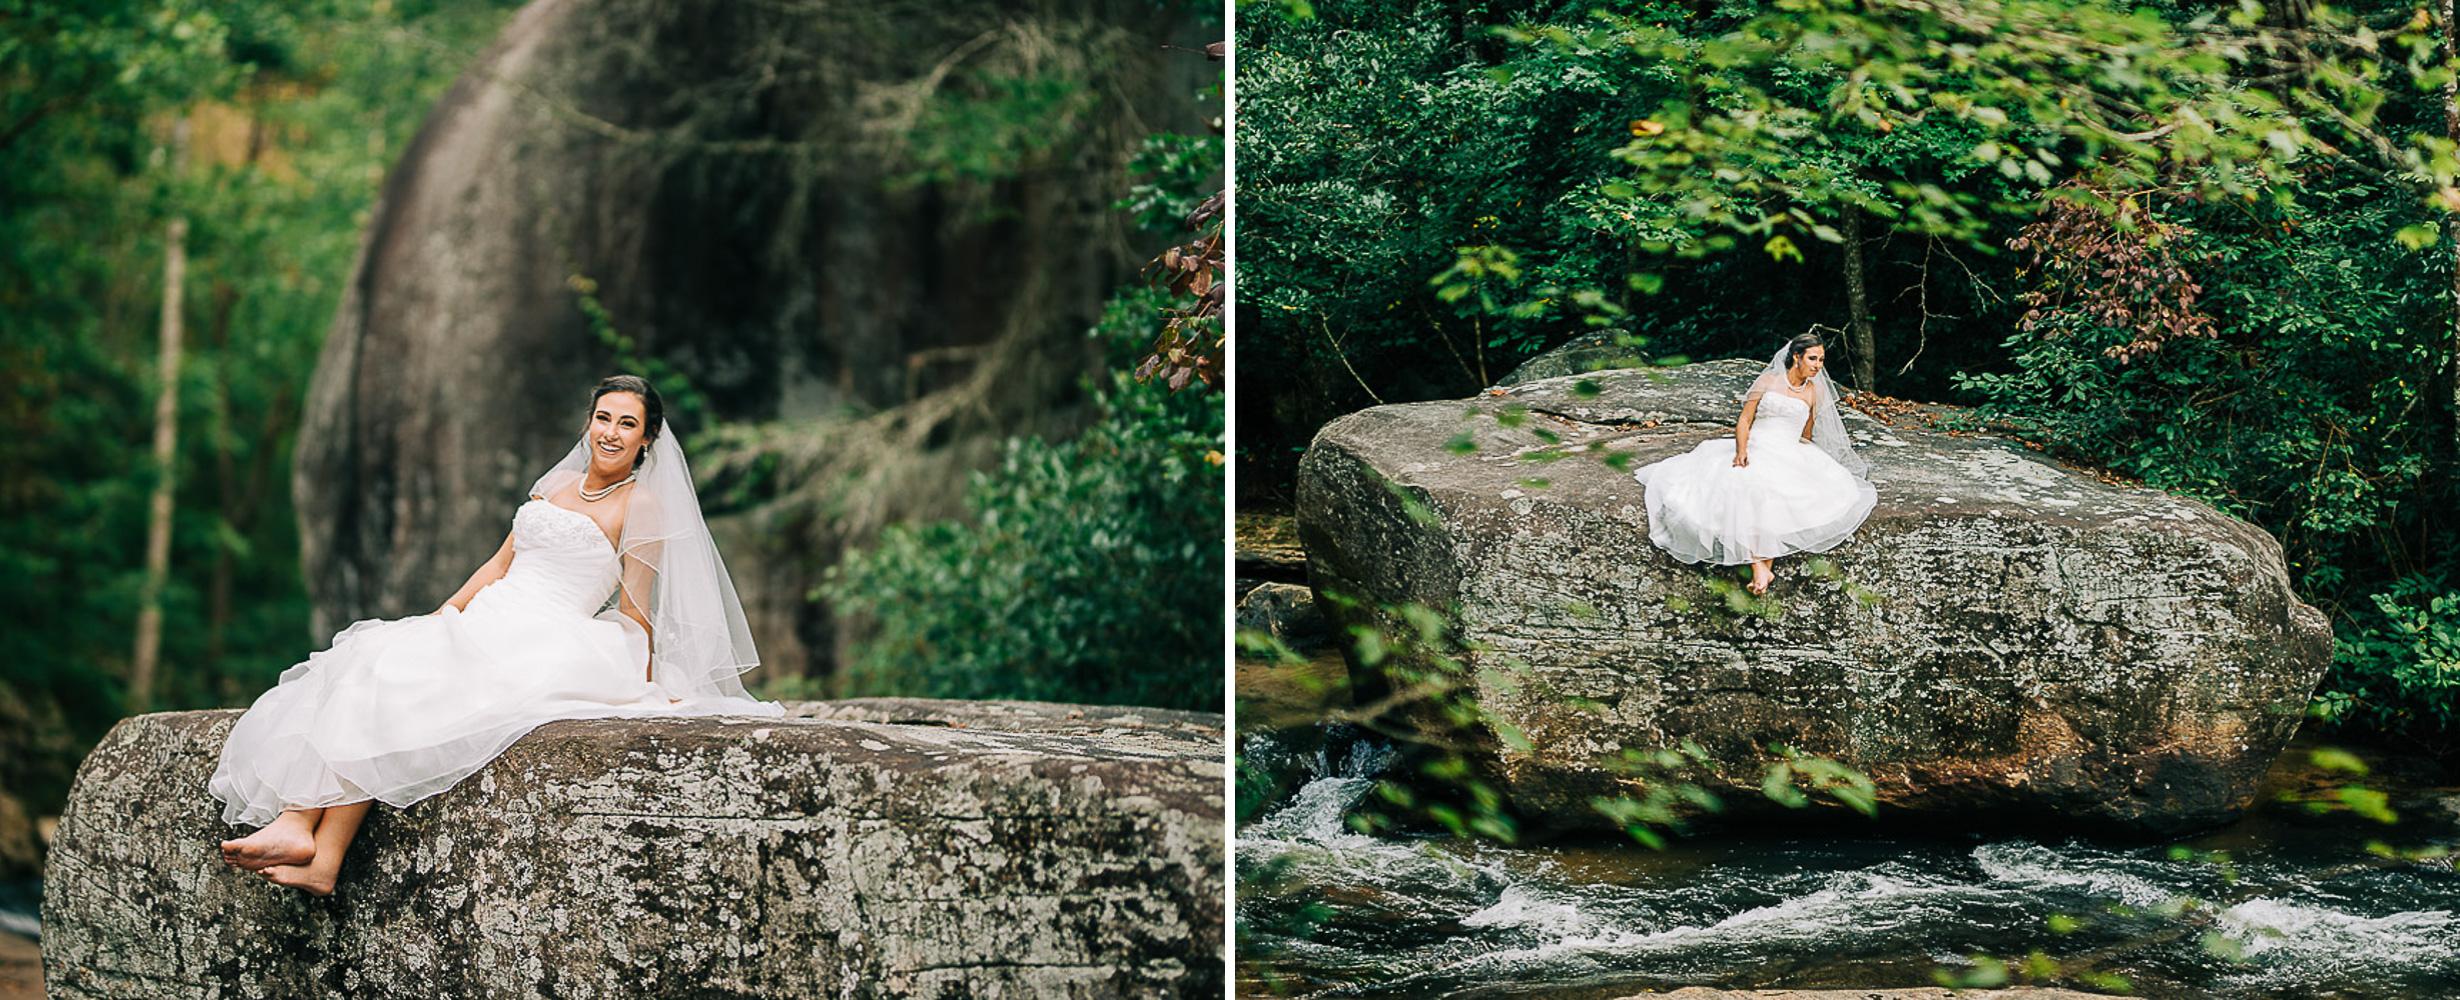 River Bridal Portraits, South Carolina Wedding Photographer, 15.jpg